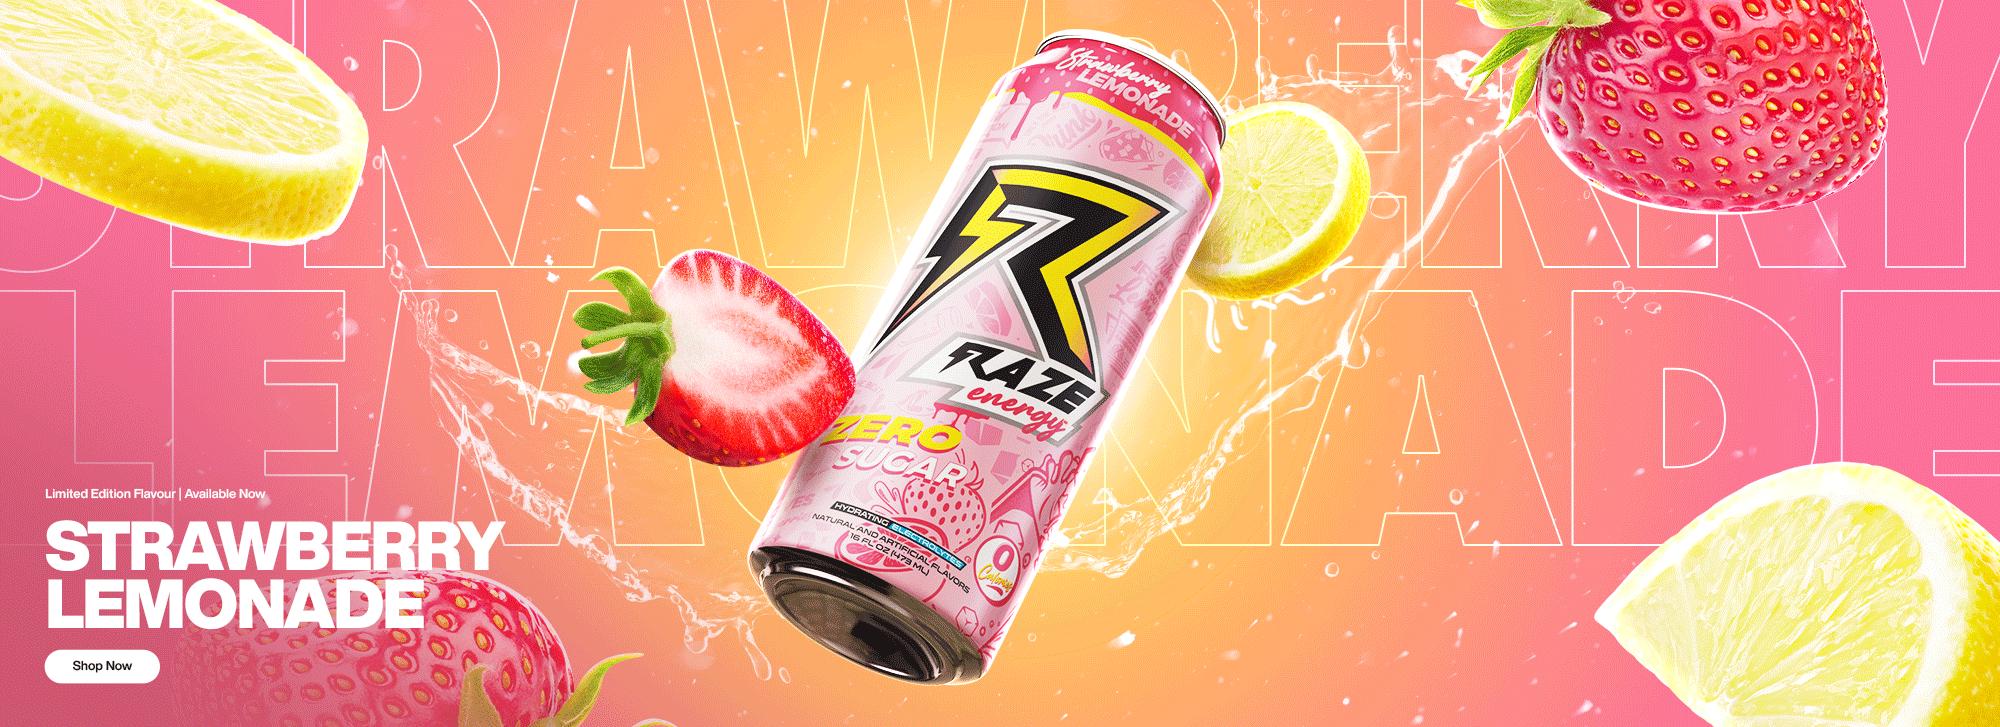 Raze Strawberry Lemonade